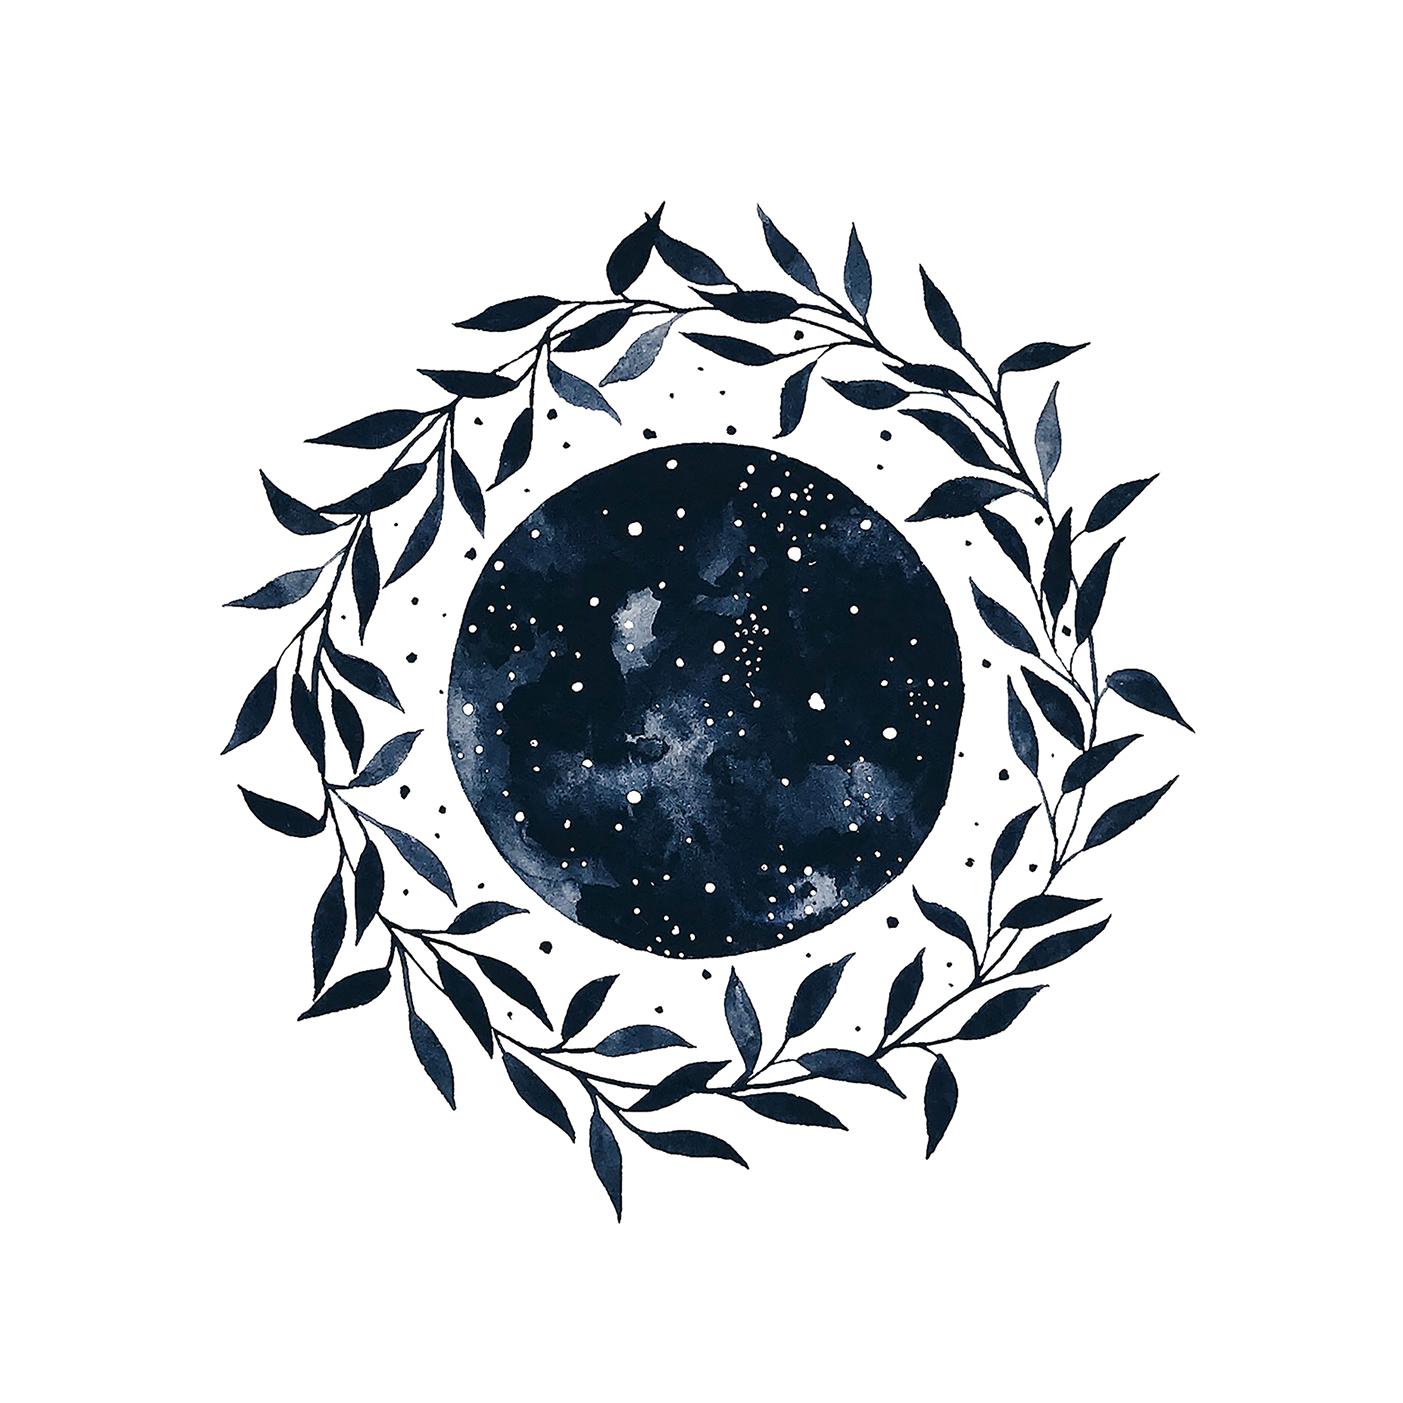 Moon_wreath_claudiaiarca